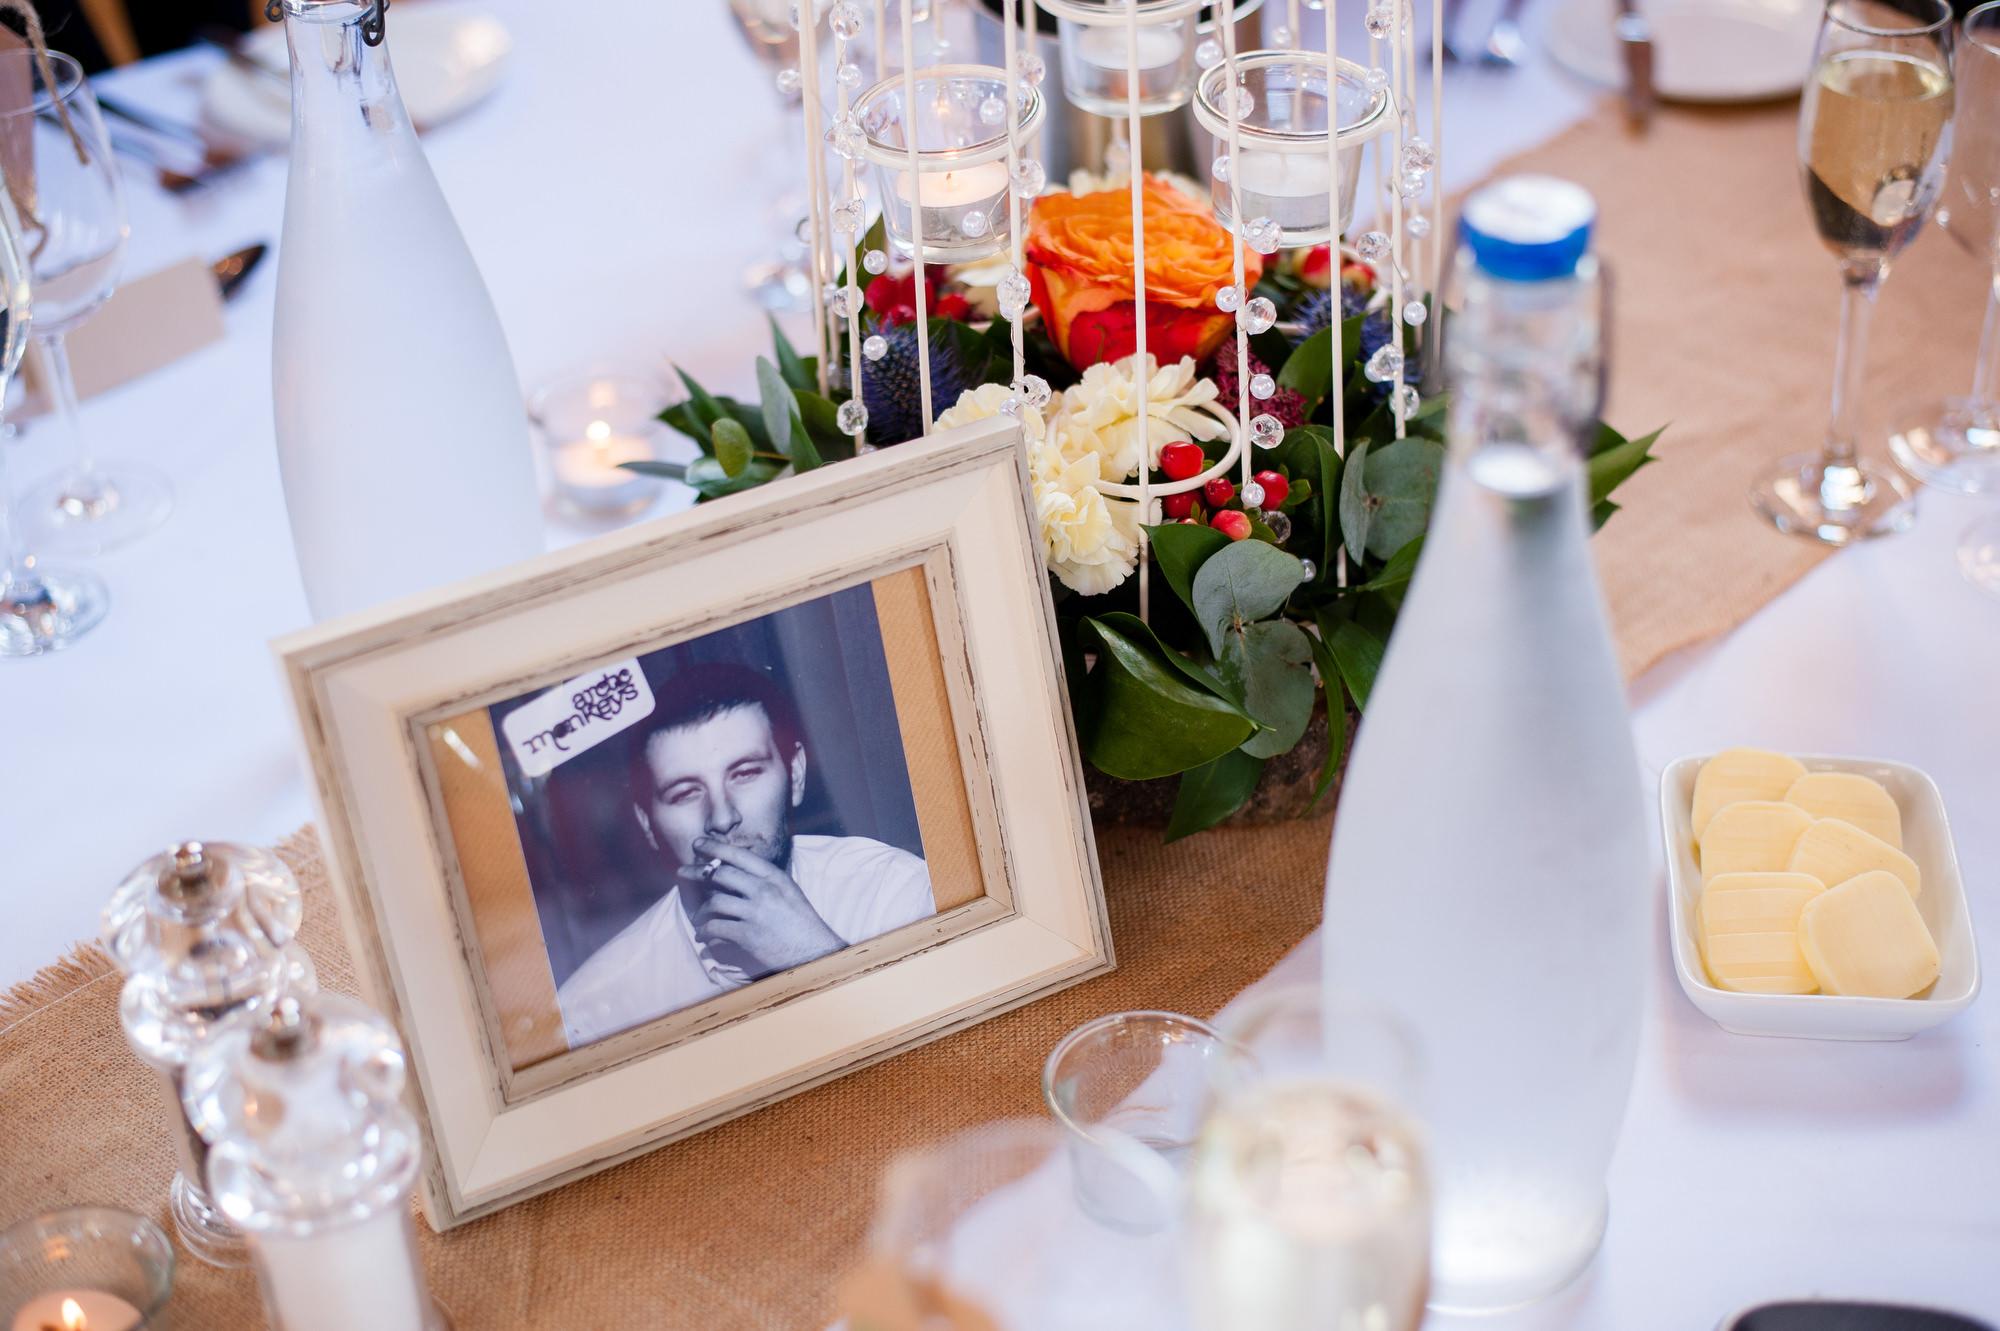 Geoff-Kirby-photography-Carriage-Hall-wedding0090